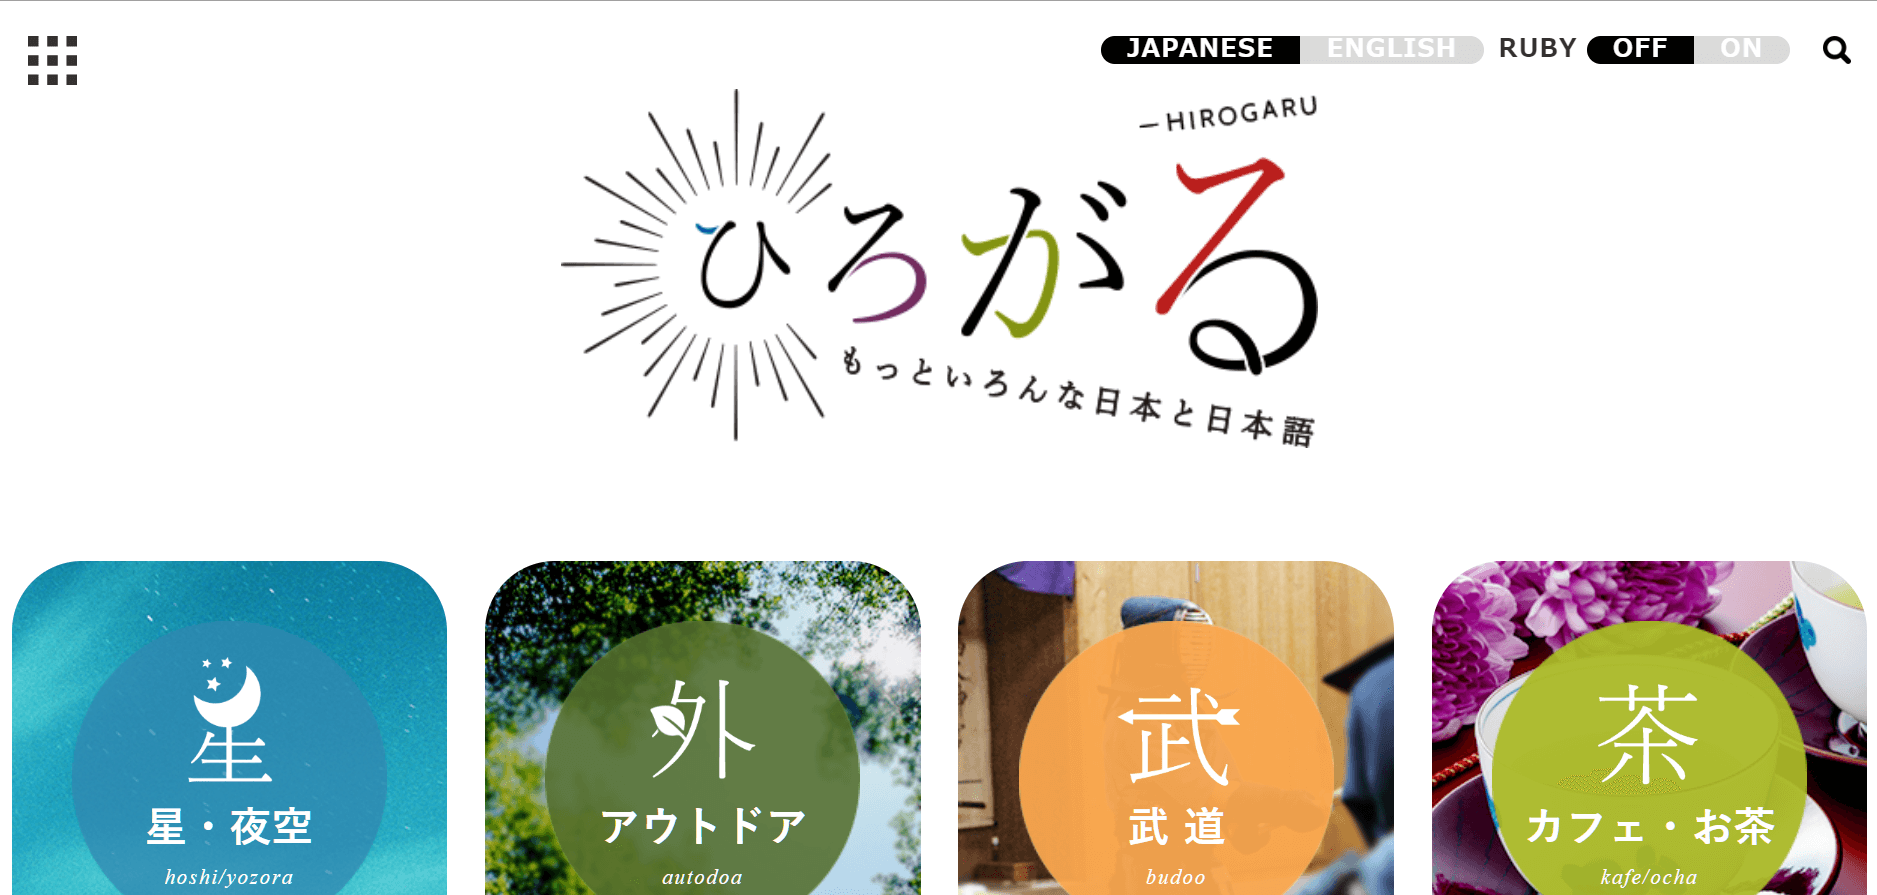 hirogaru homepage